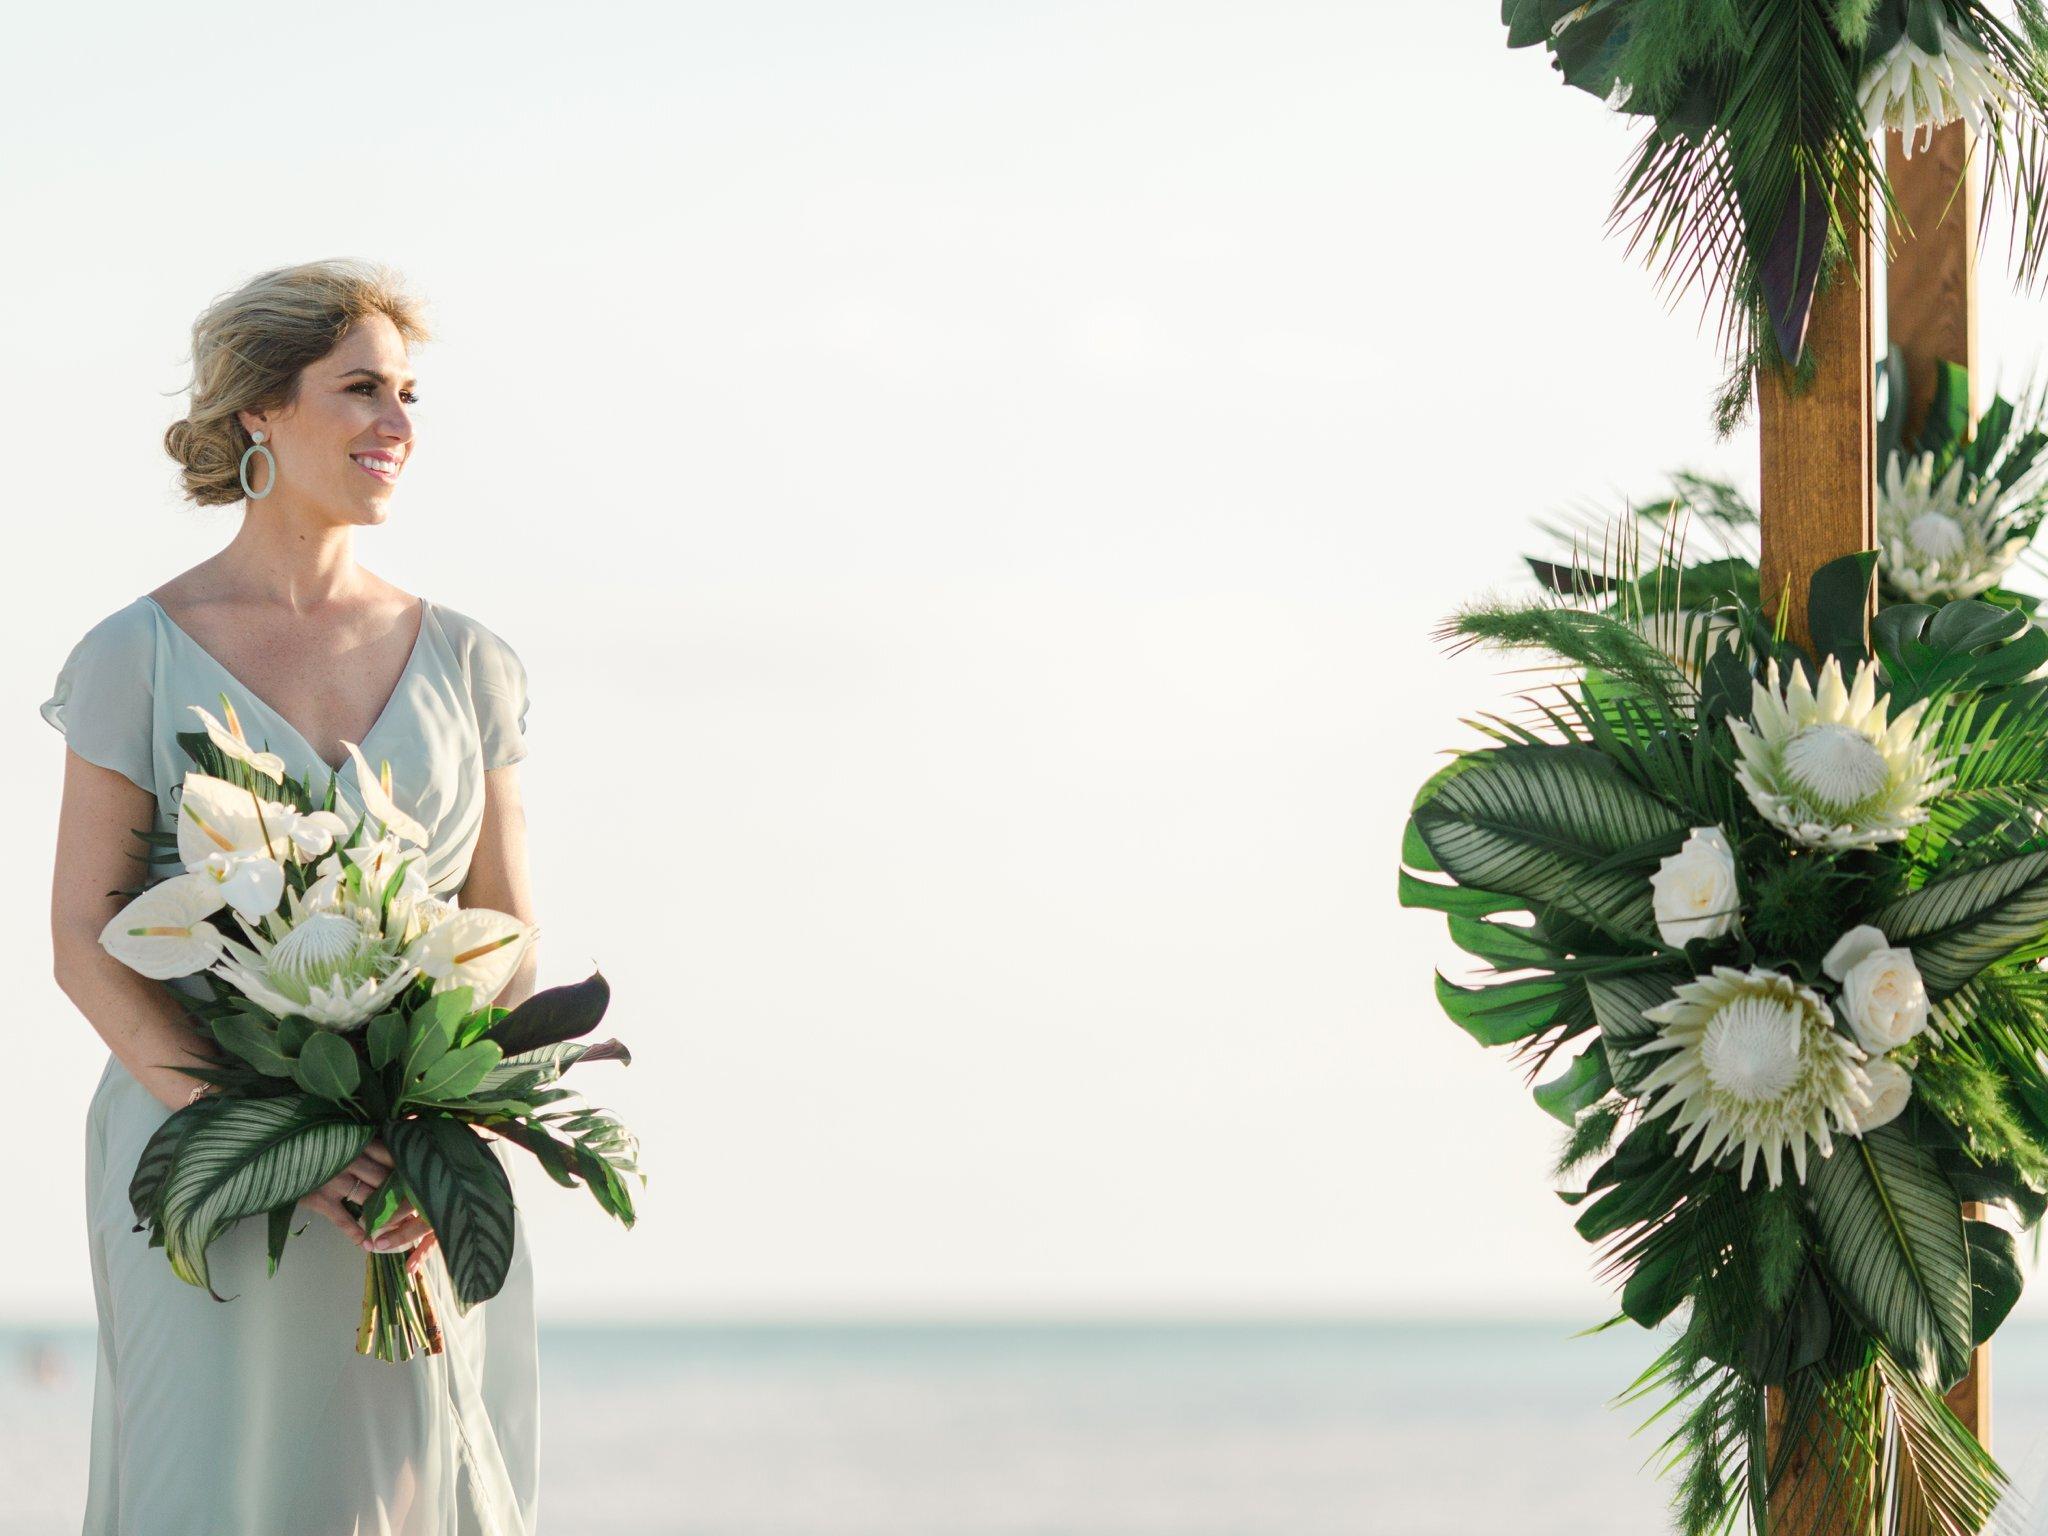 jw marriott marco island wedding photographer marco island wedding photographer shannon griffin photography_0172.jpg